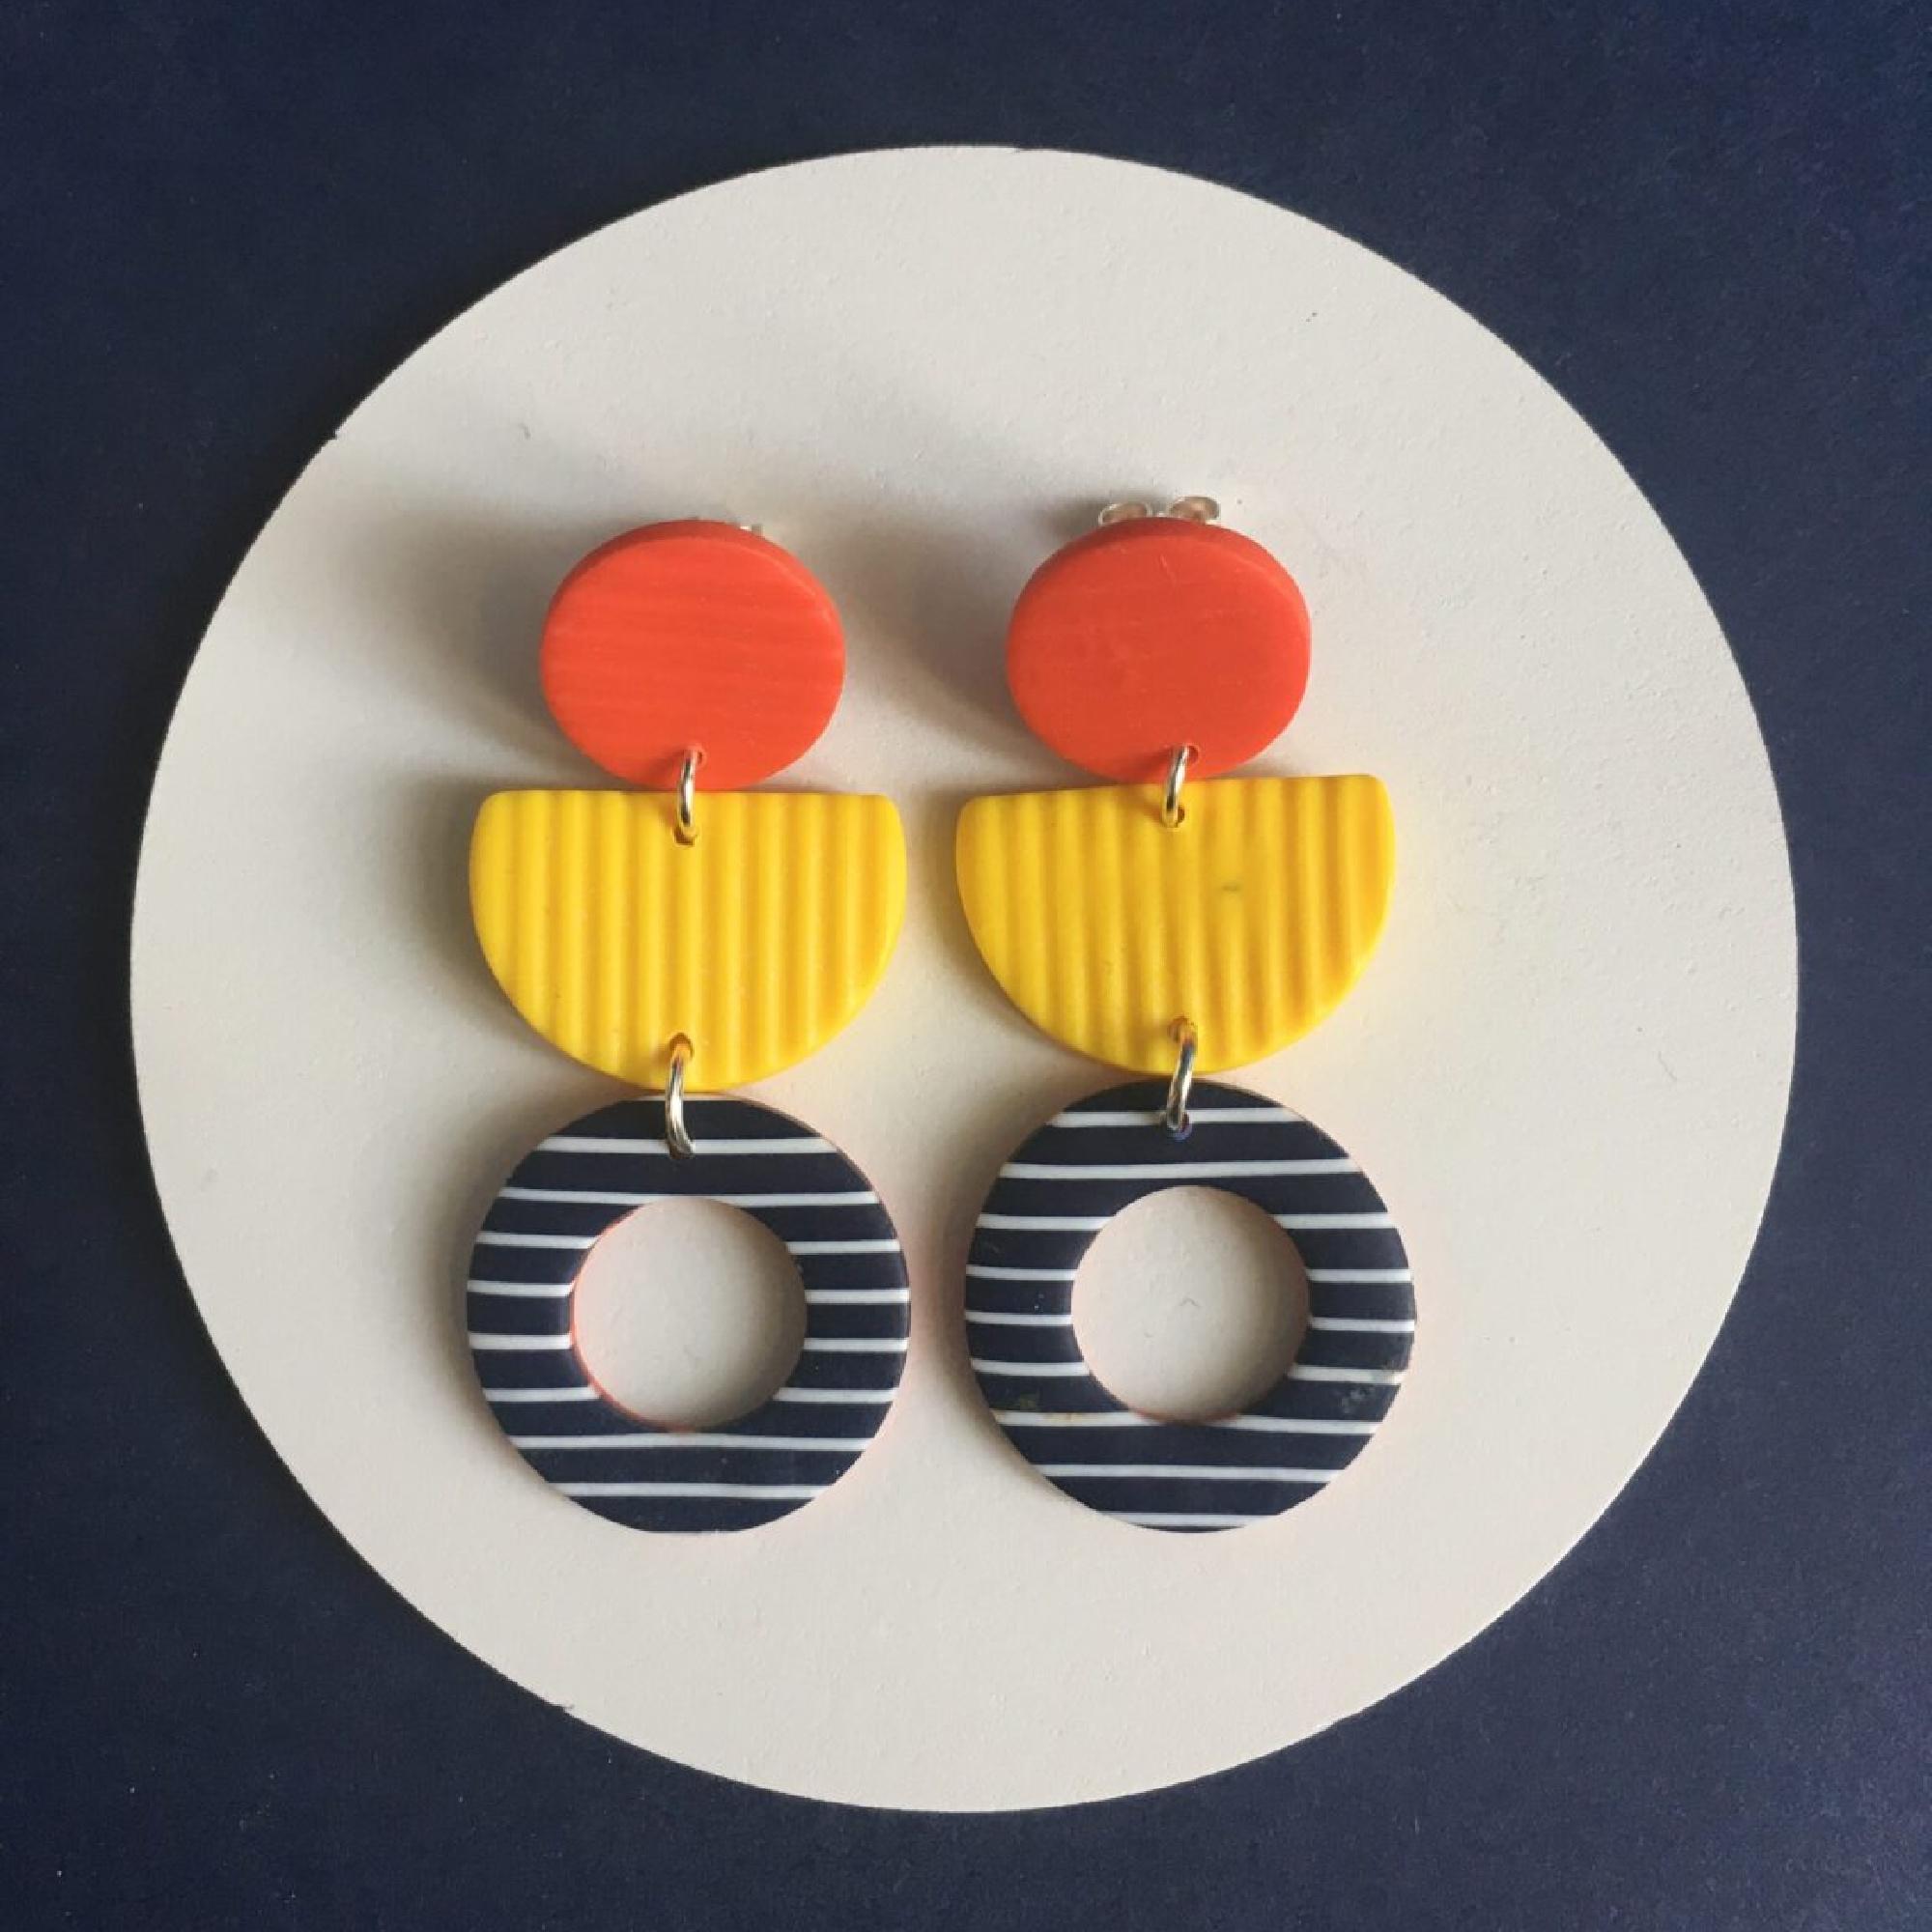 Pornic Breton Earrings by Nadege Honey